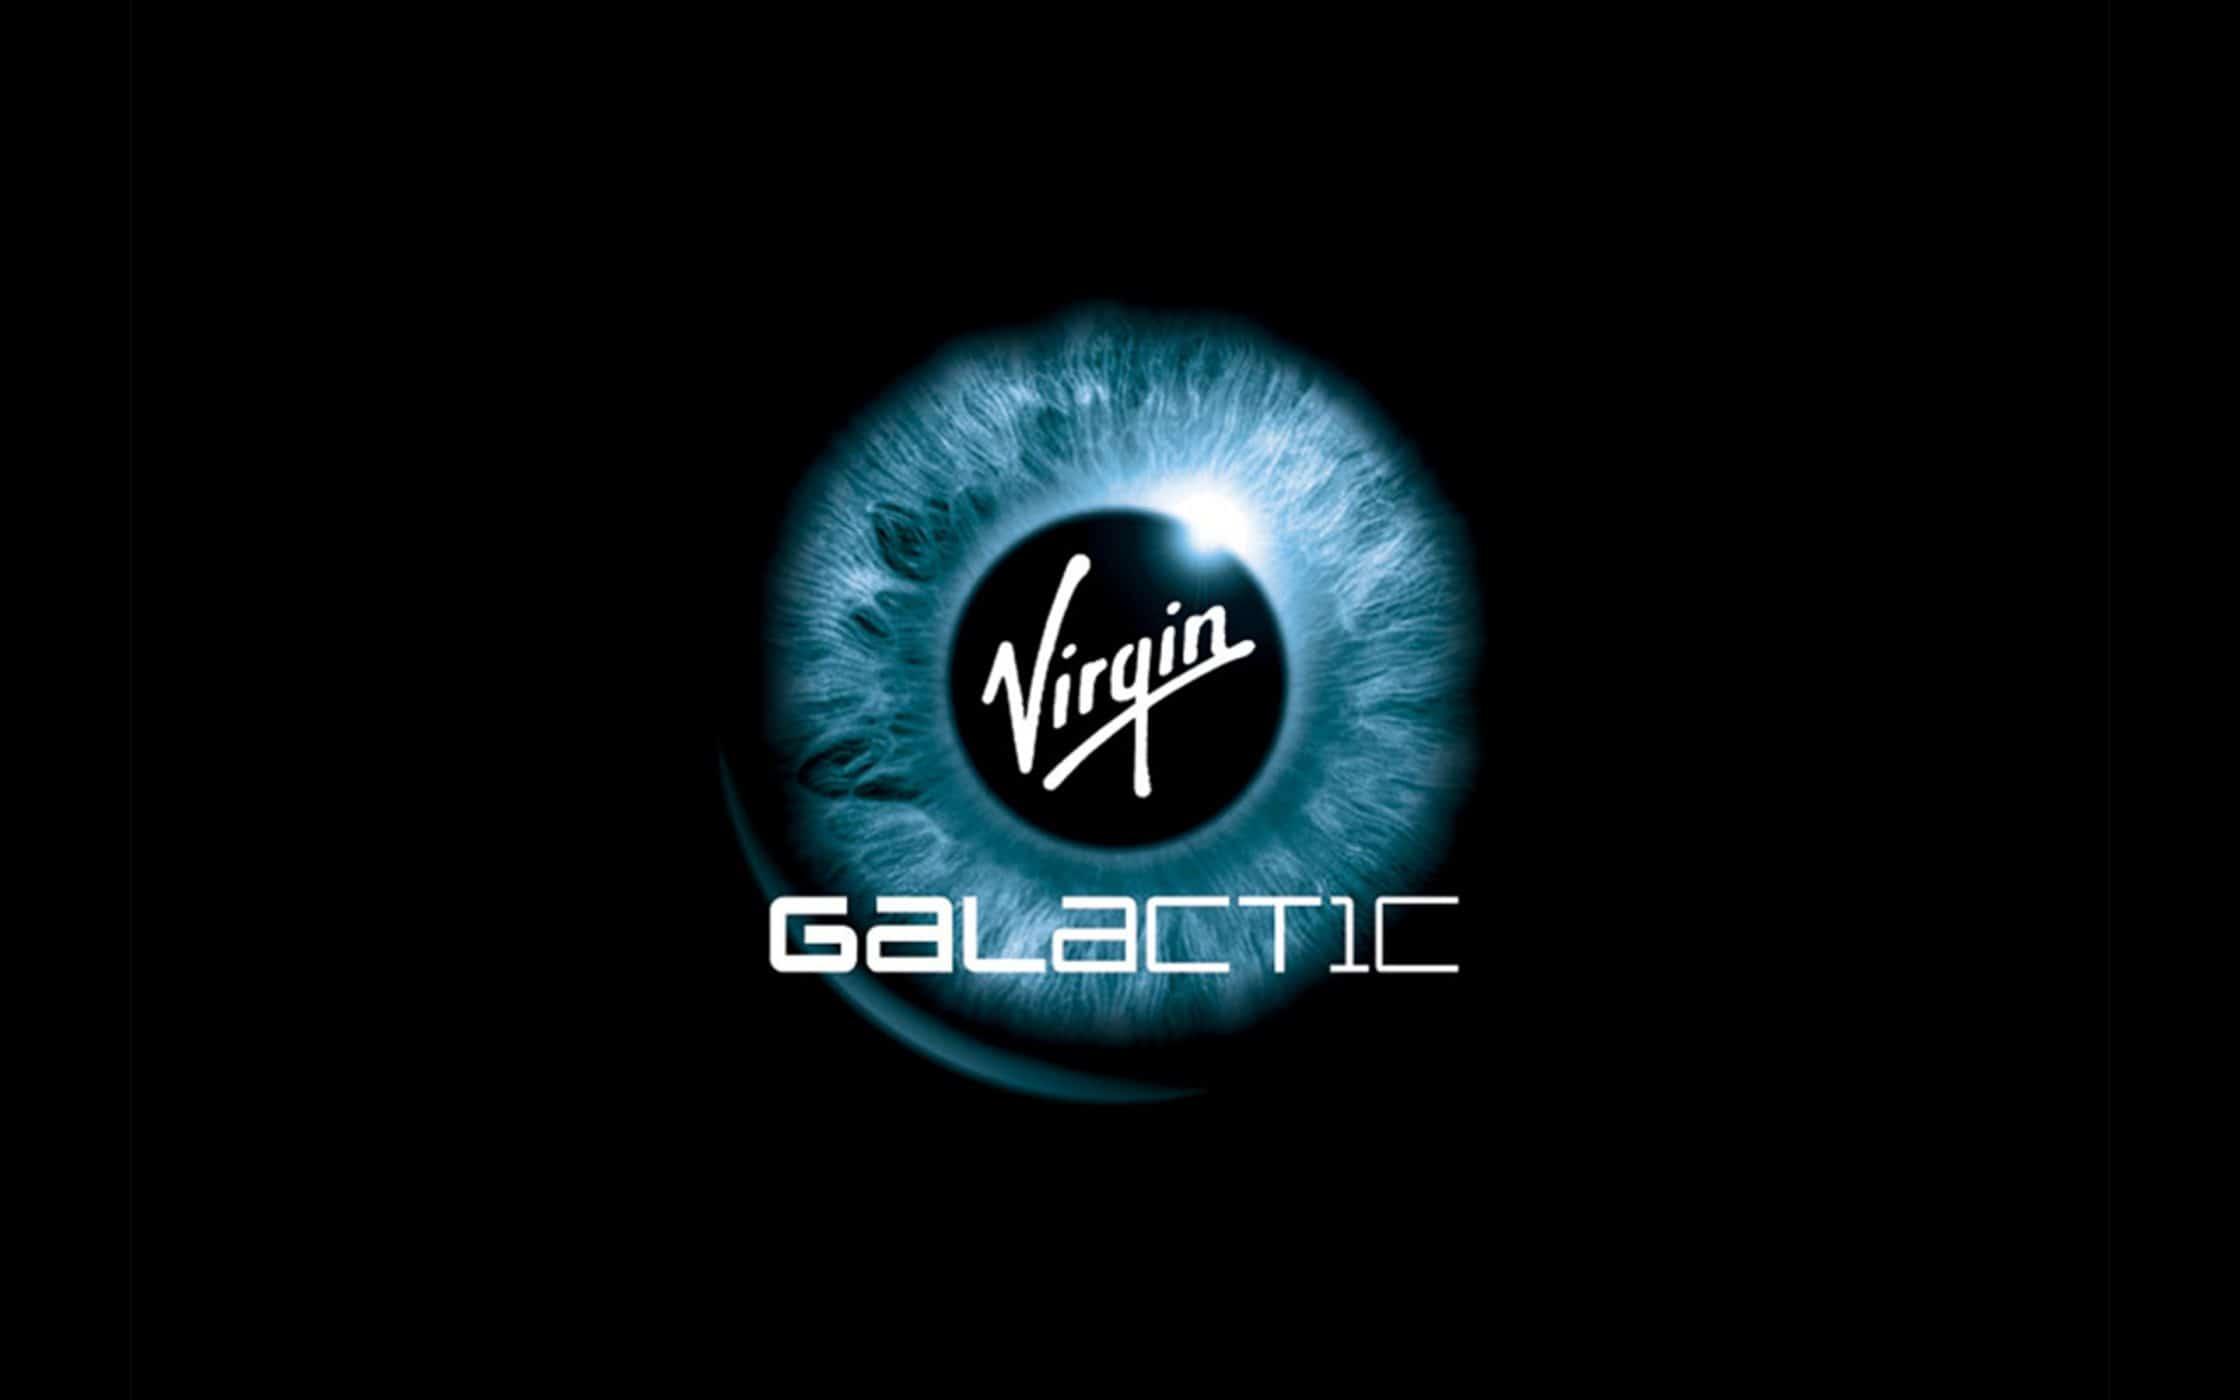 Virgin-Galactic-1.jpg